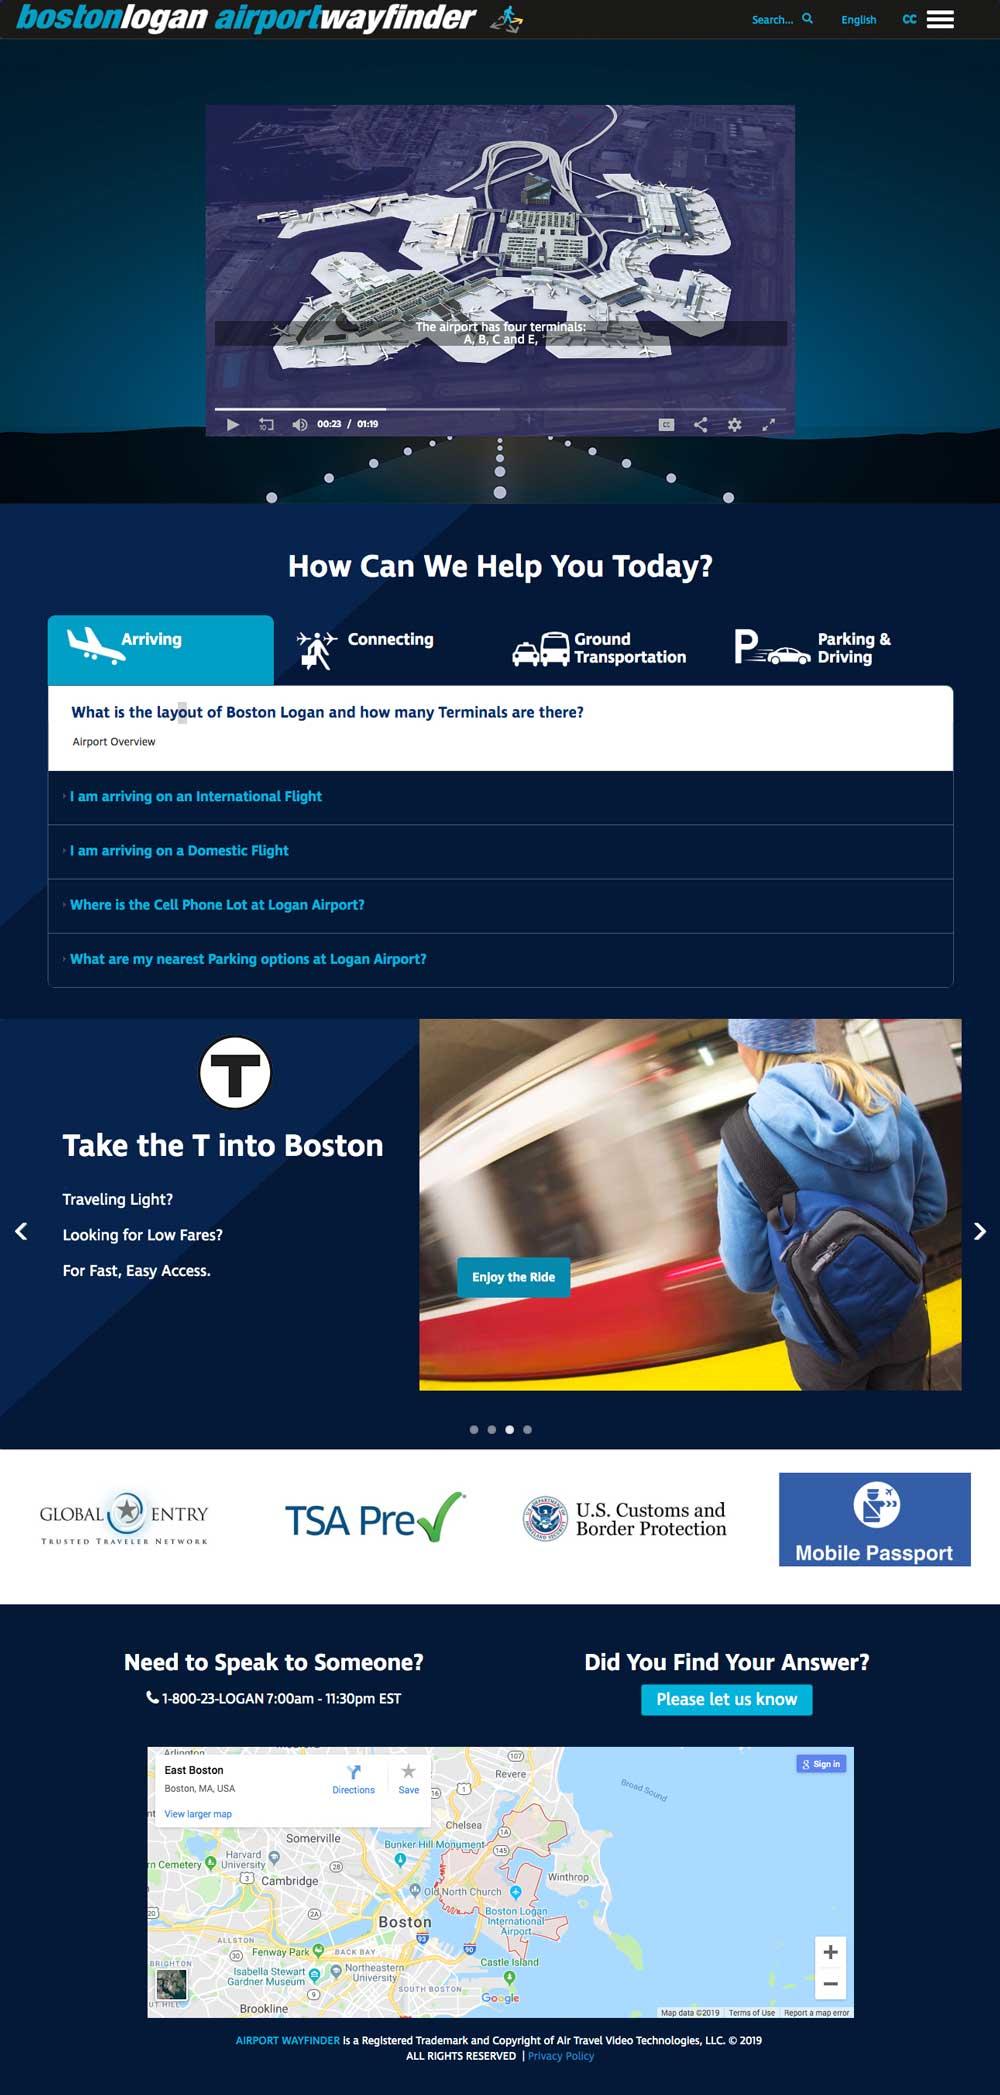 Boston Airport Wayfinder image for take the T into Boston